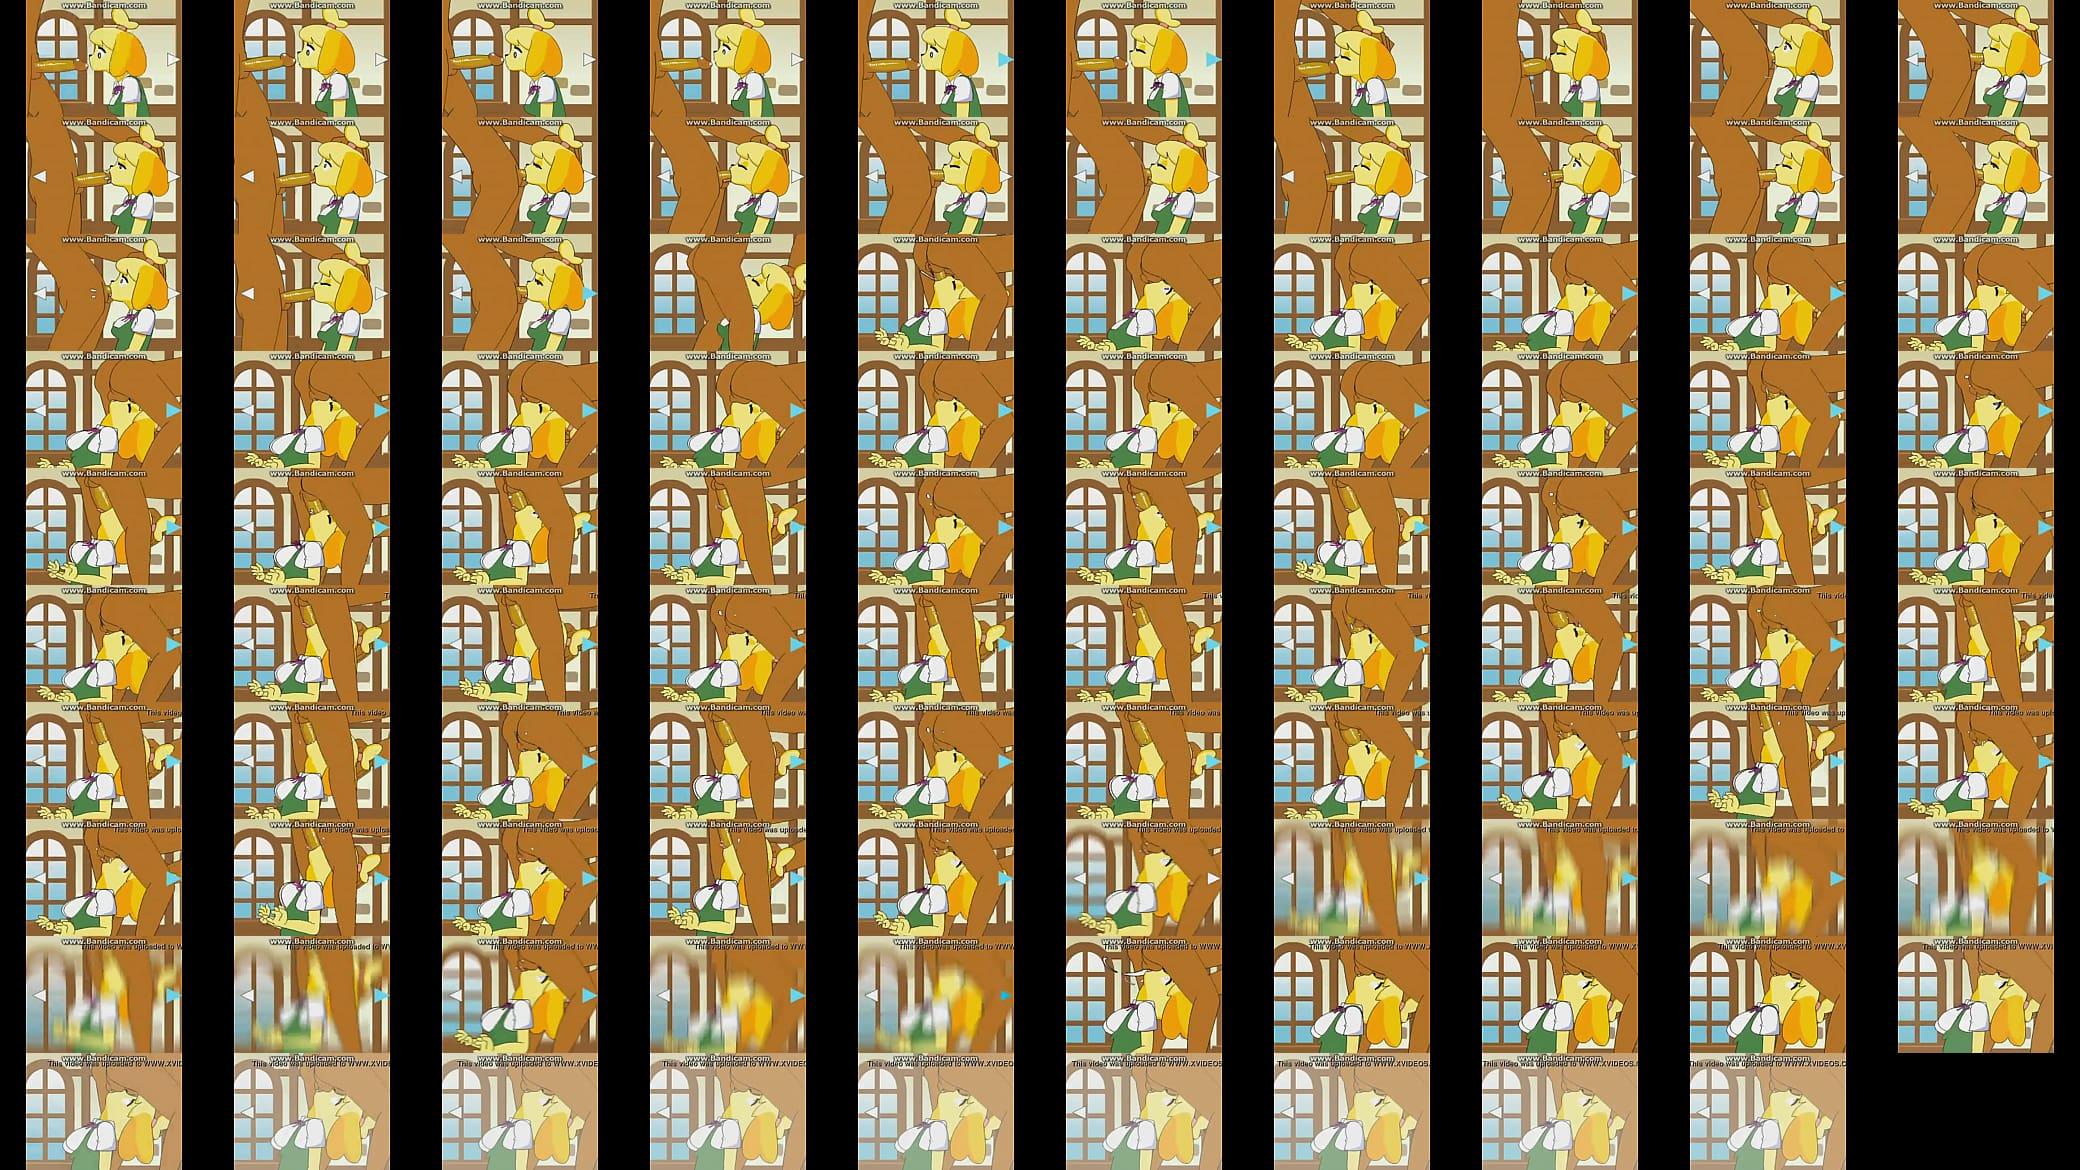 Animal Crossing Mayor Porn Mayor isabelle sucking the mayor/ sync-suck cover - xvideos